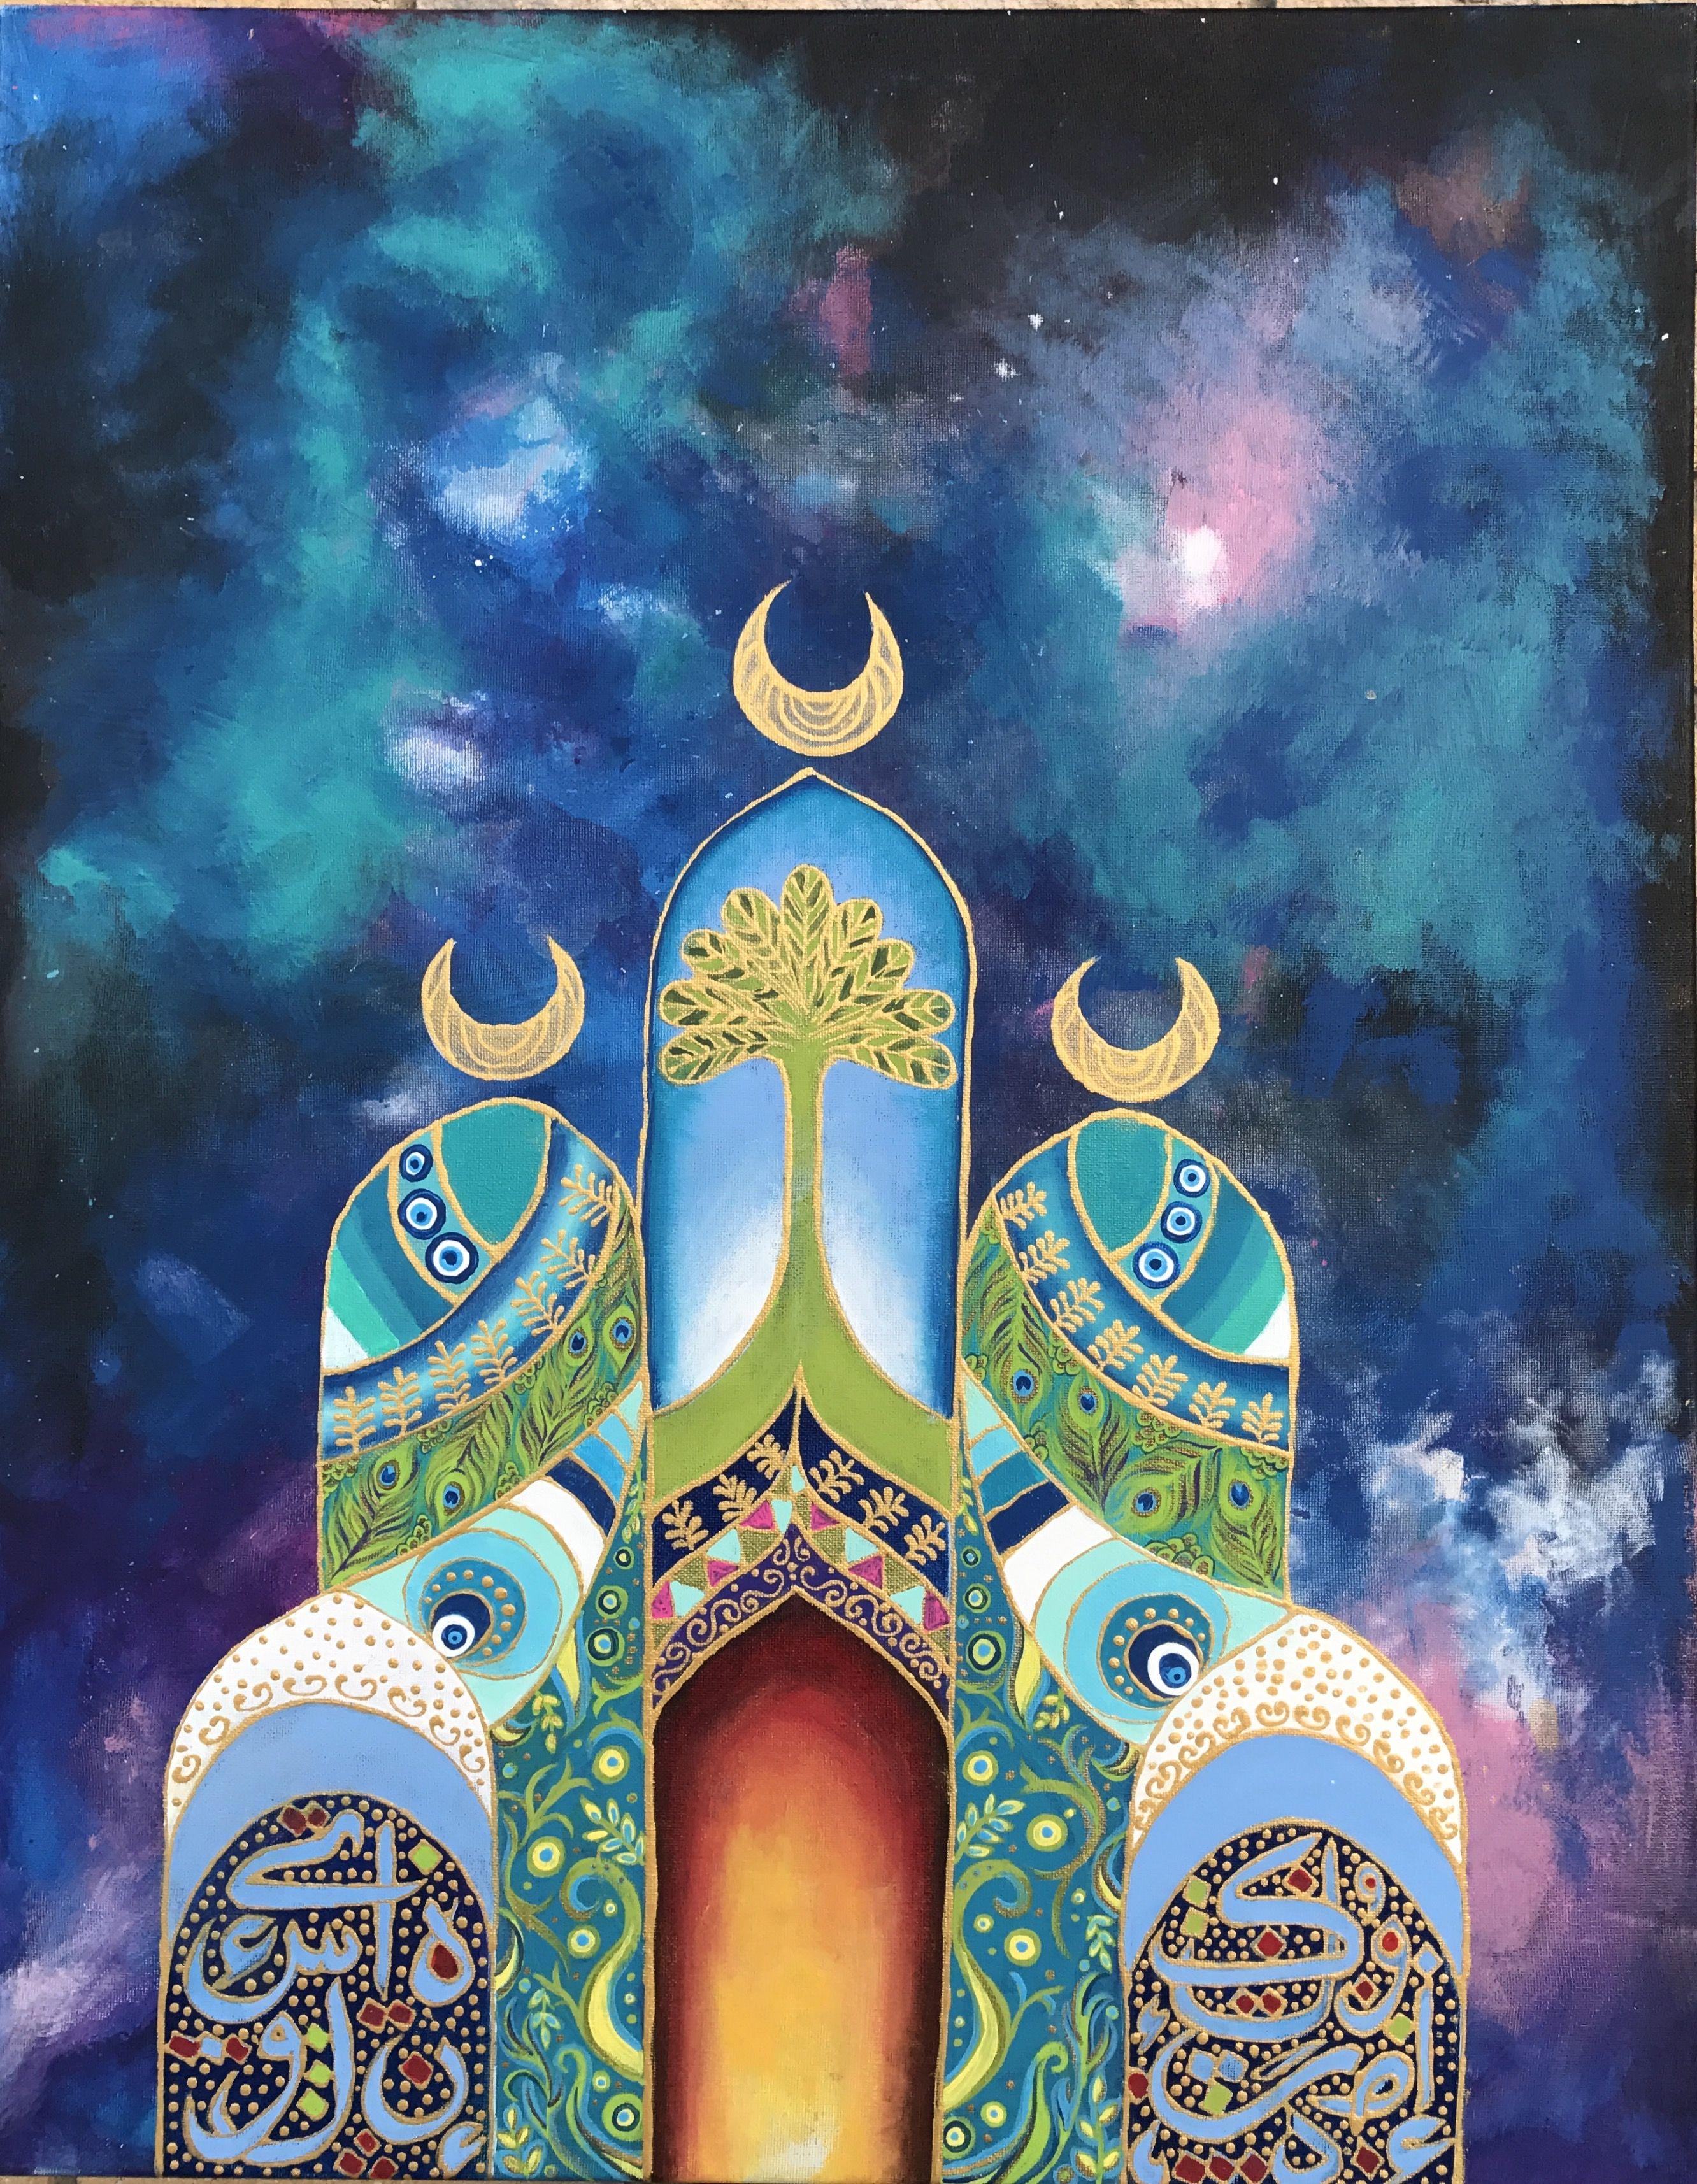 فن تشكيلي عراقي رسومات Islamic Art Calligraphy Cubist Art Arabian Art